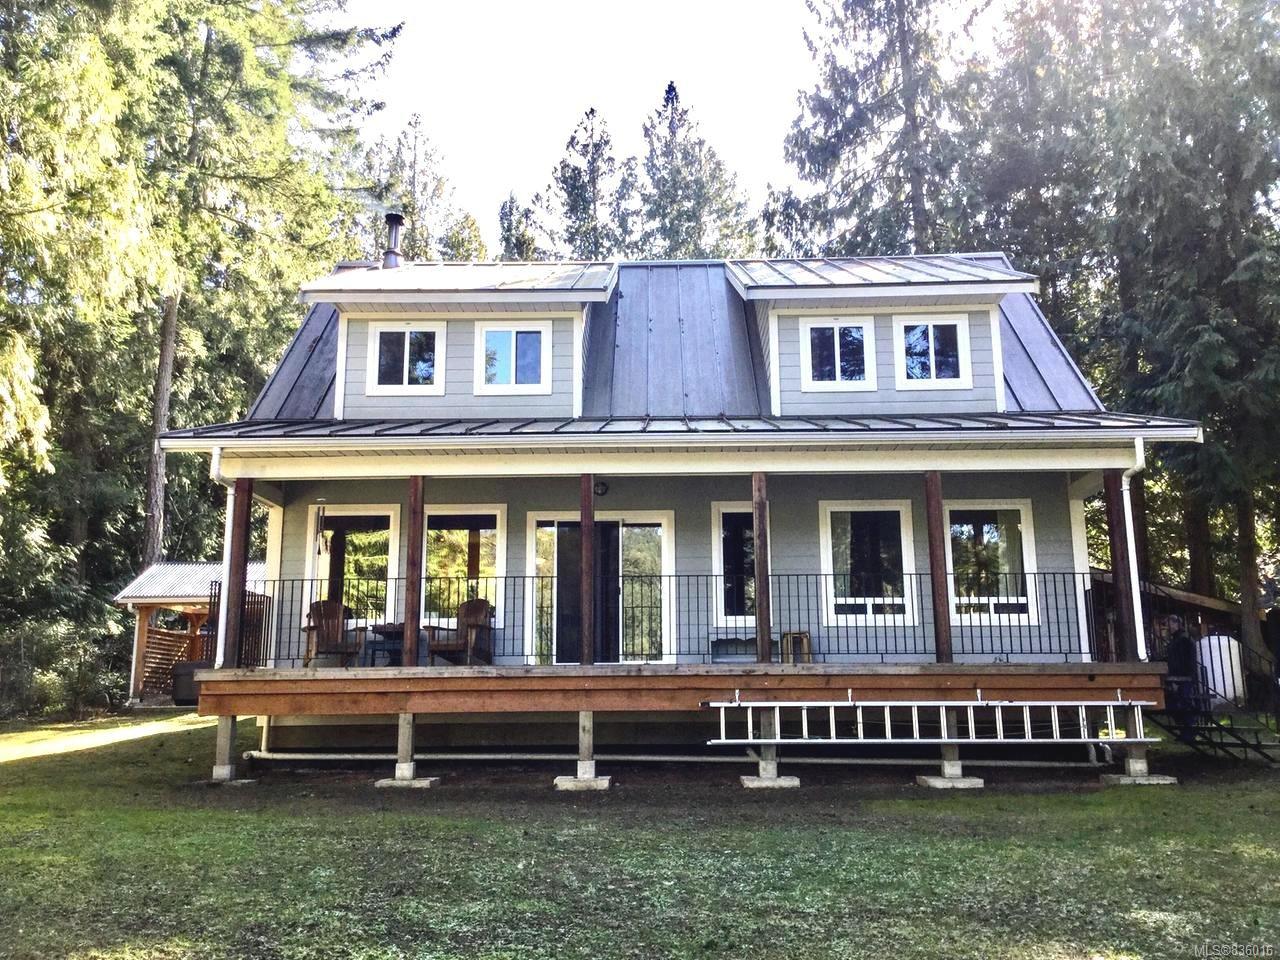 Main Photo: 432 Coho Blvd in MUDGE ISLAND: Isl Mudge Island House for sale (Islands)  : MLS®# 836016